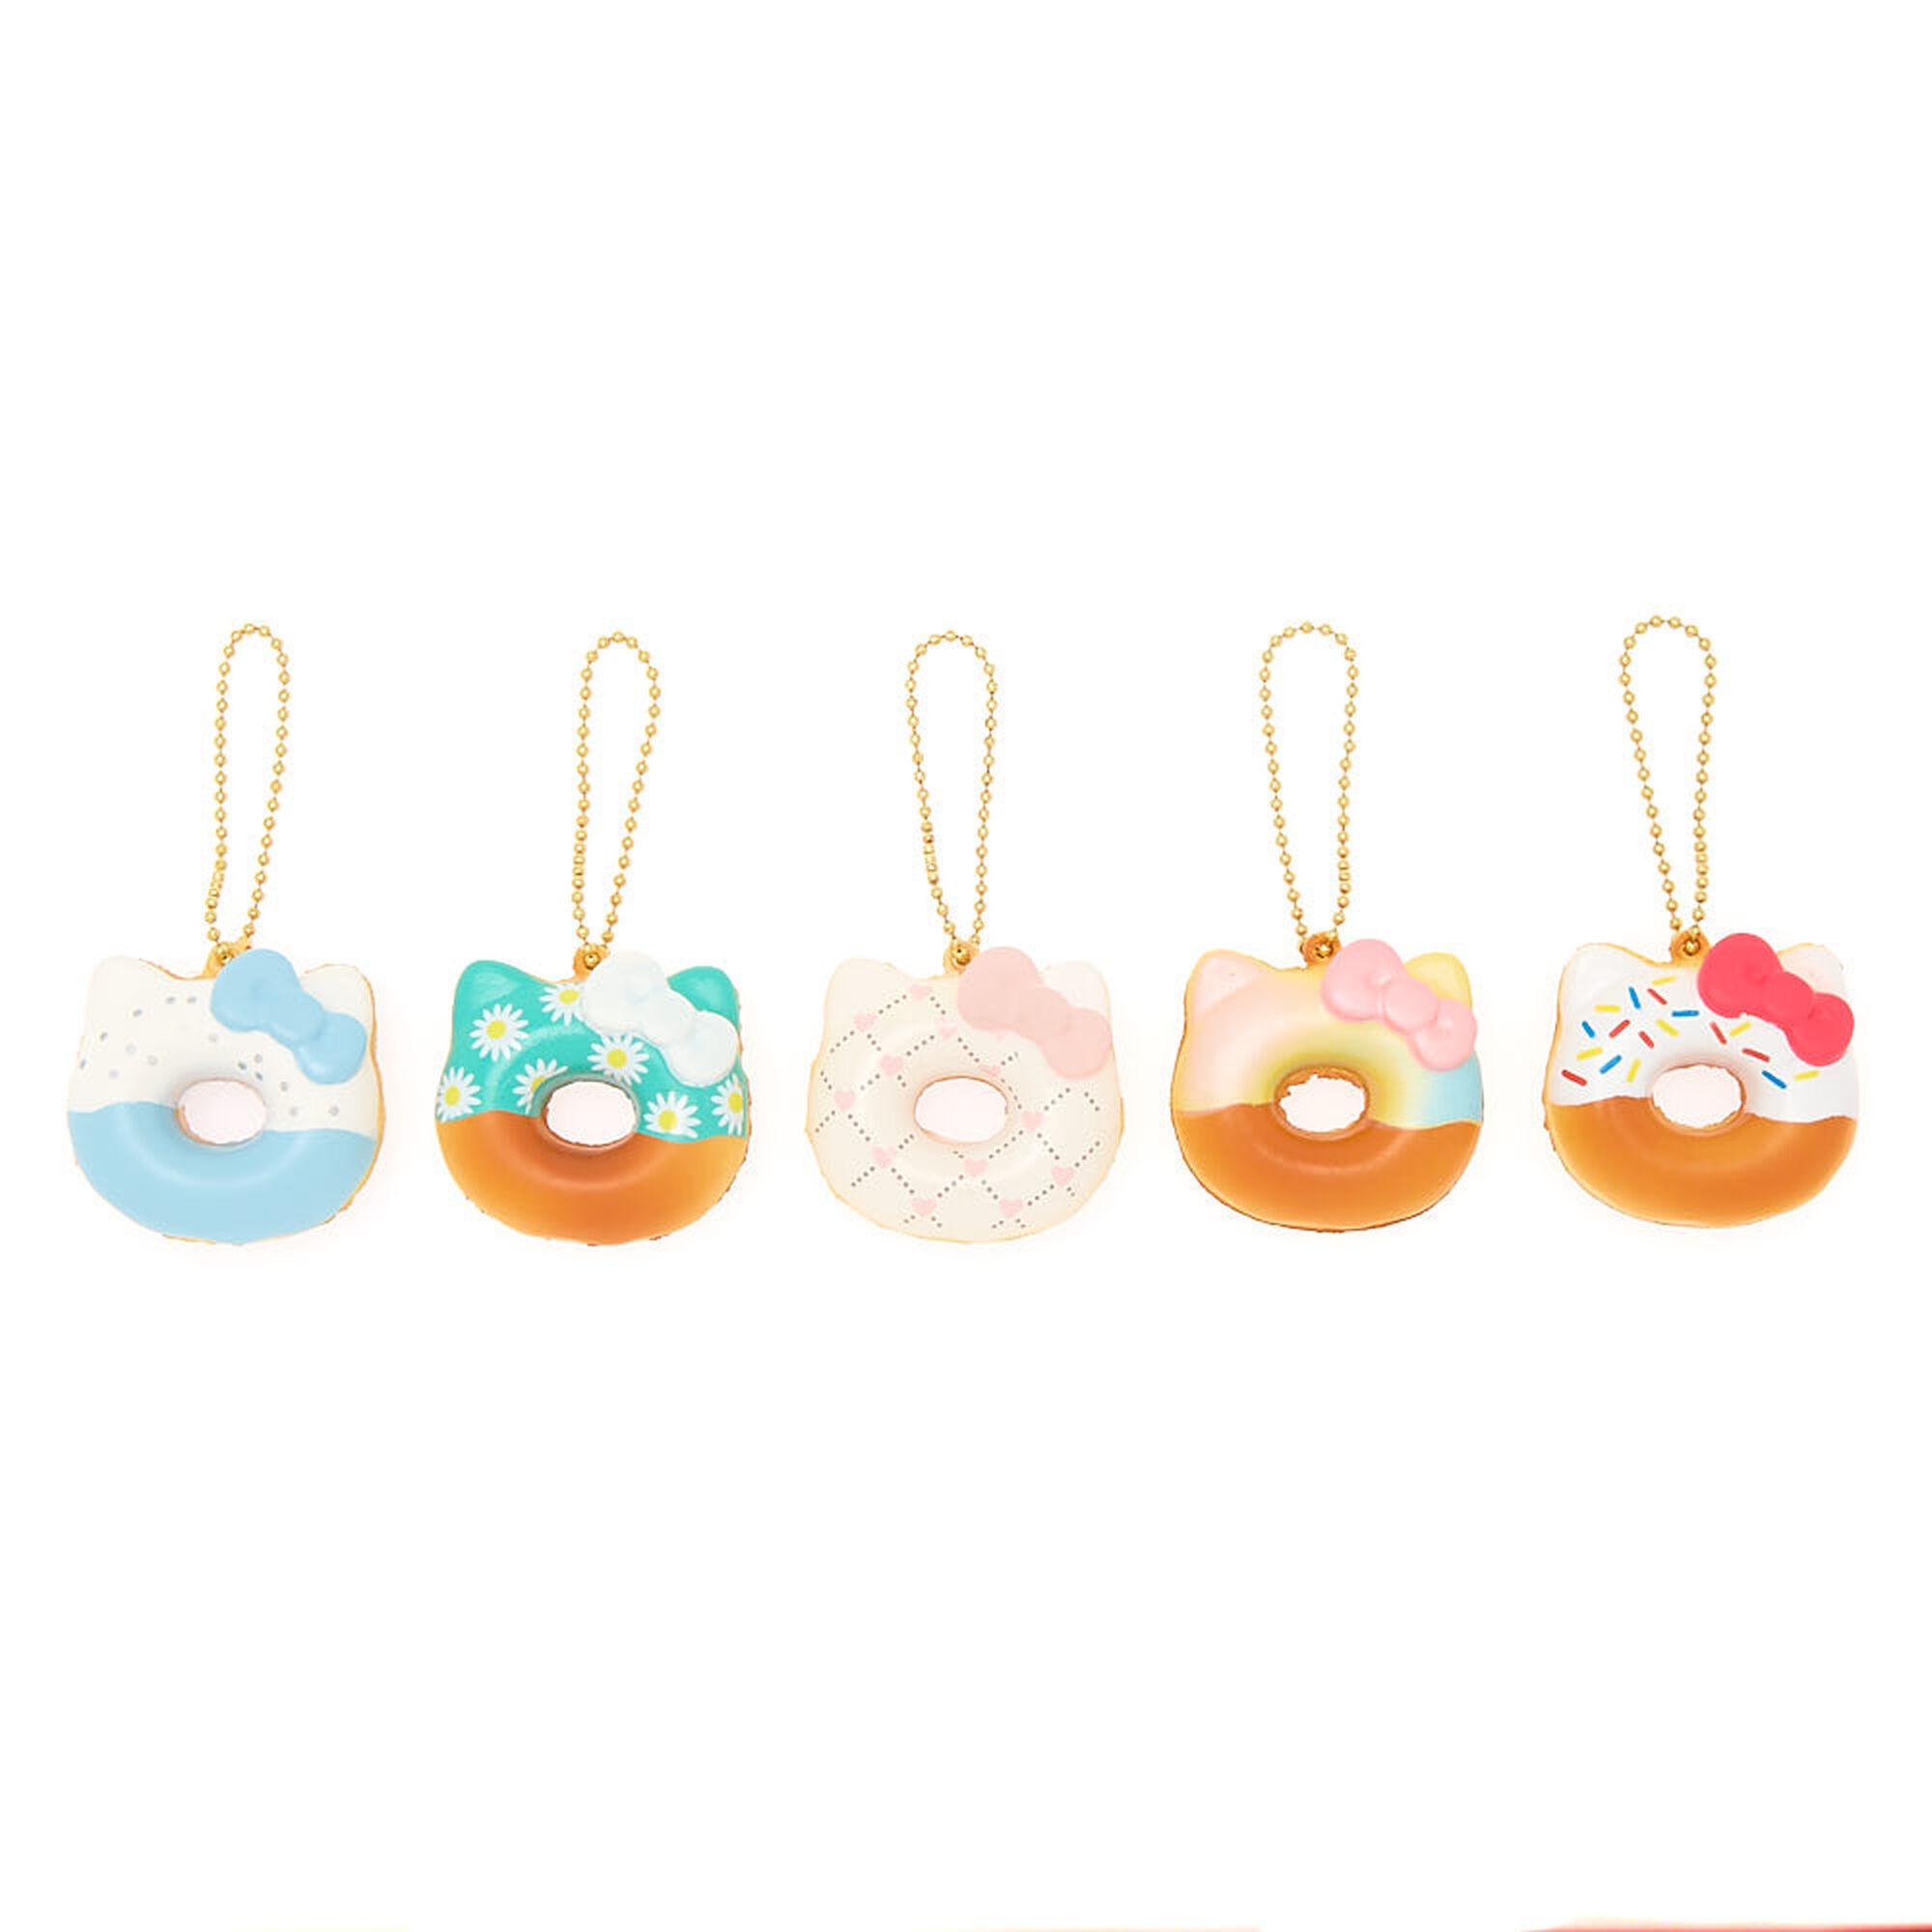 900084404 ... Hello Kitty® Mini Donut Squish Toy Keychain - Styles May ...